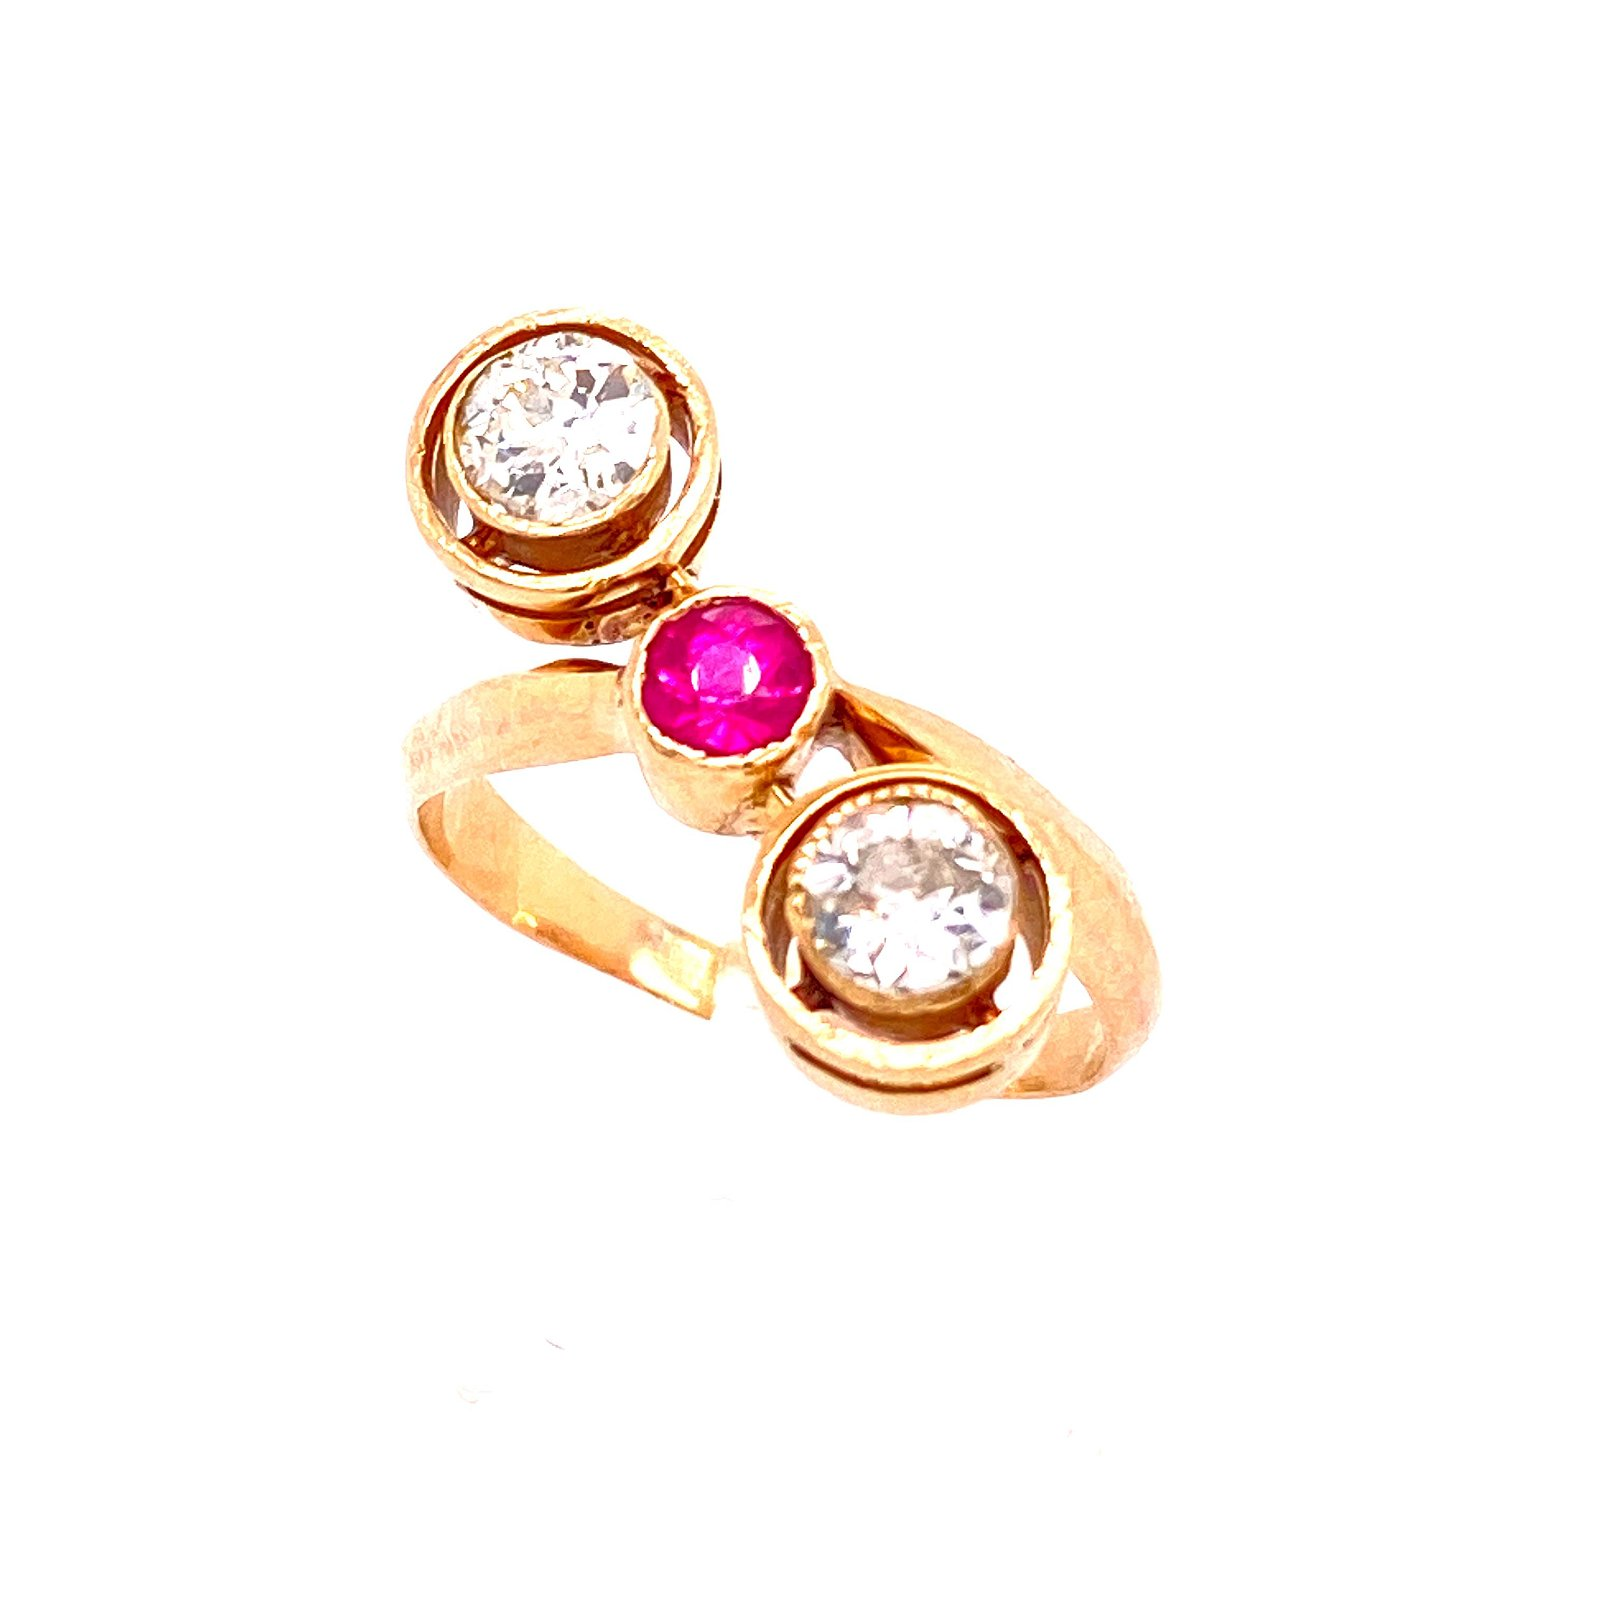 Art Nouveau 18k Gold Ruby & Diamonds